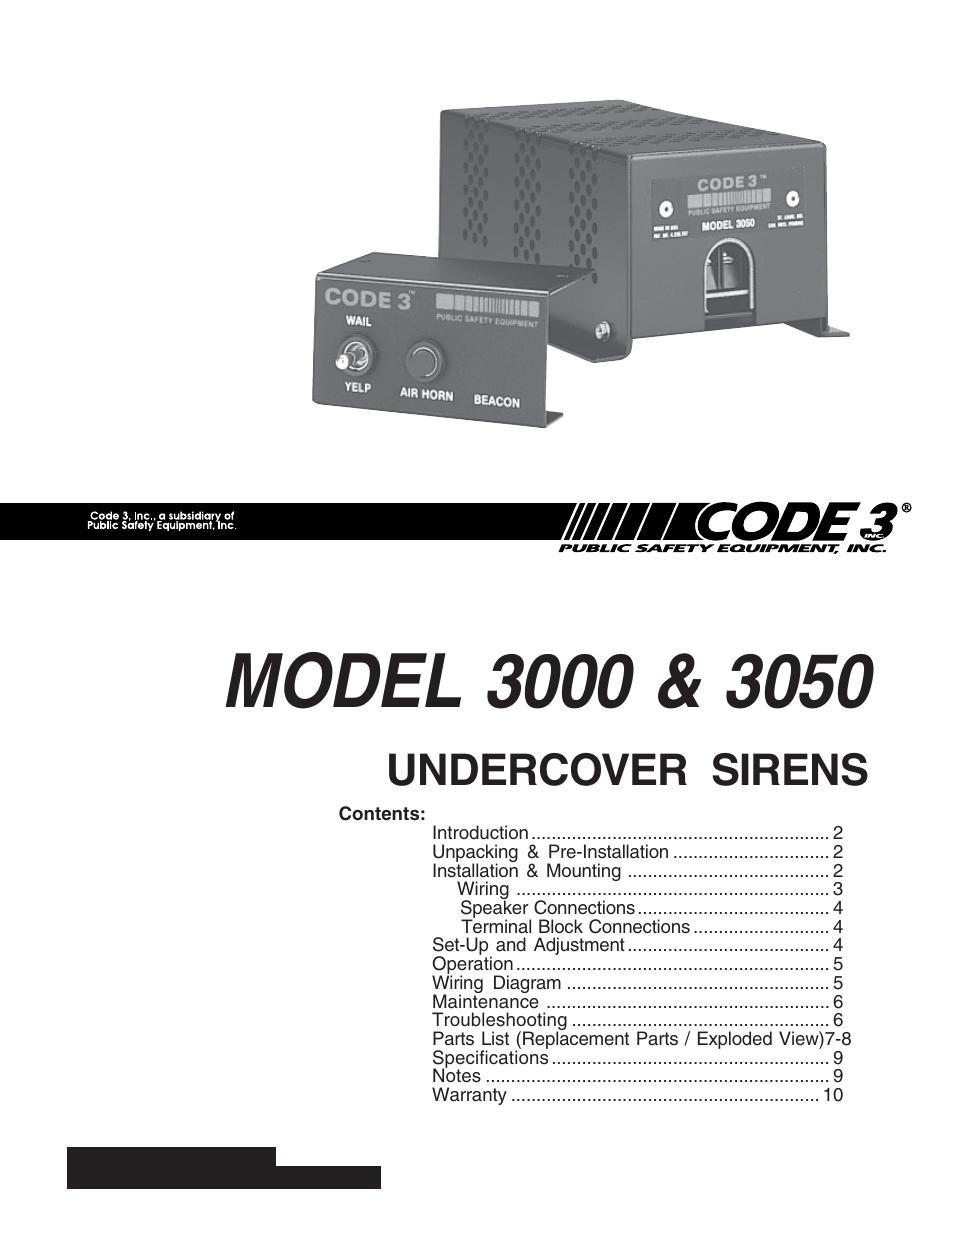 Code 3 Mx7000 Lightbar Wiring Diagram - Wiring Diagram